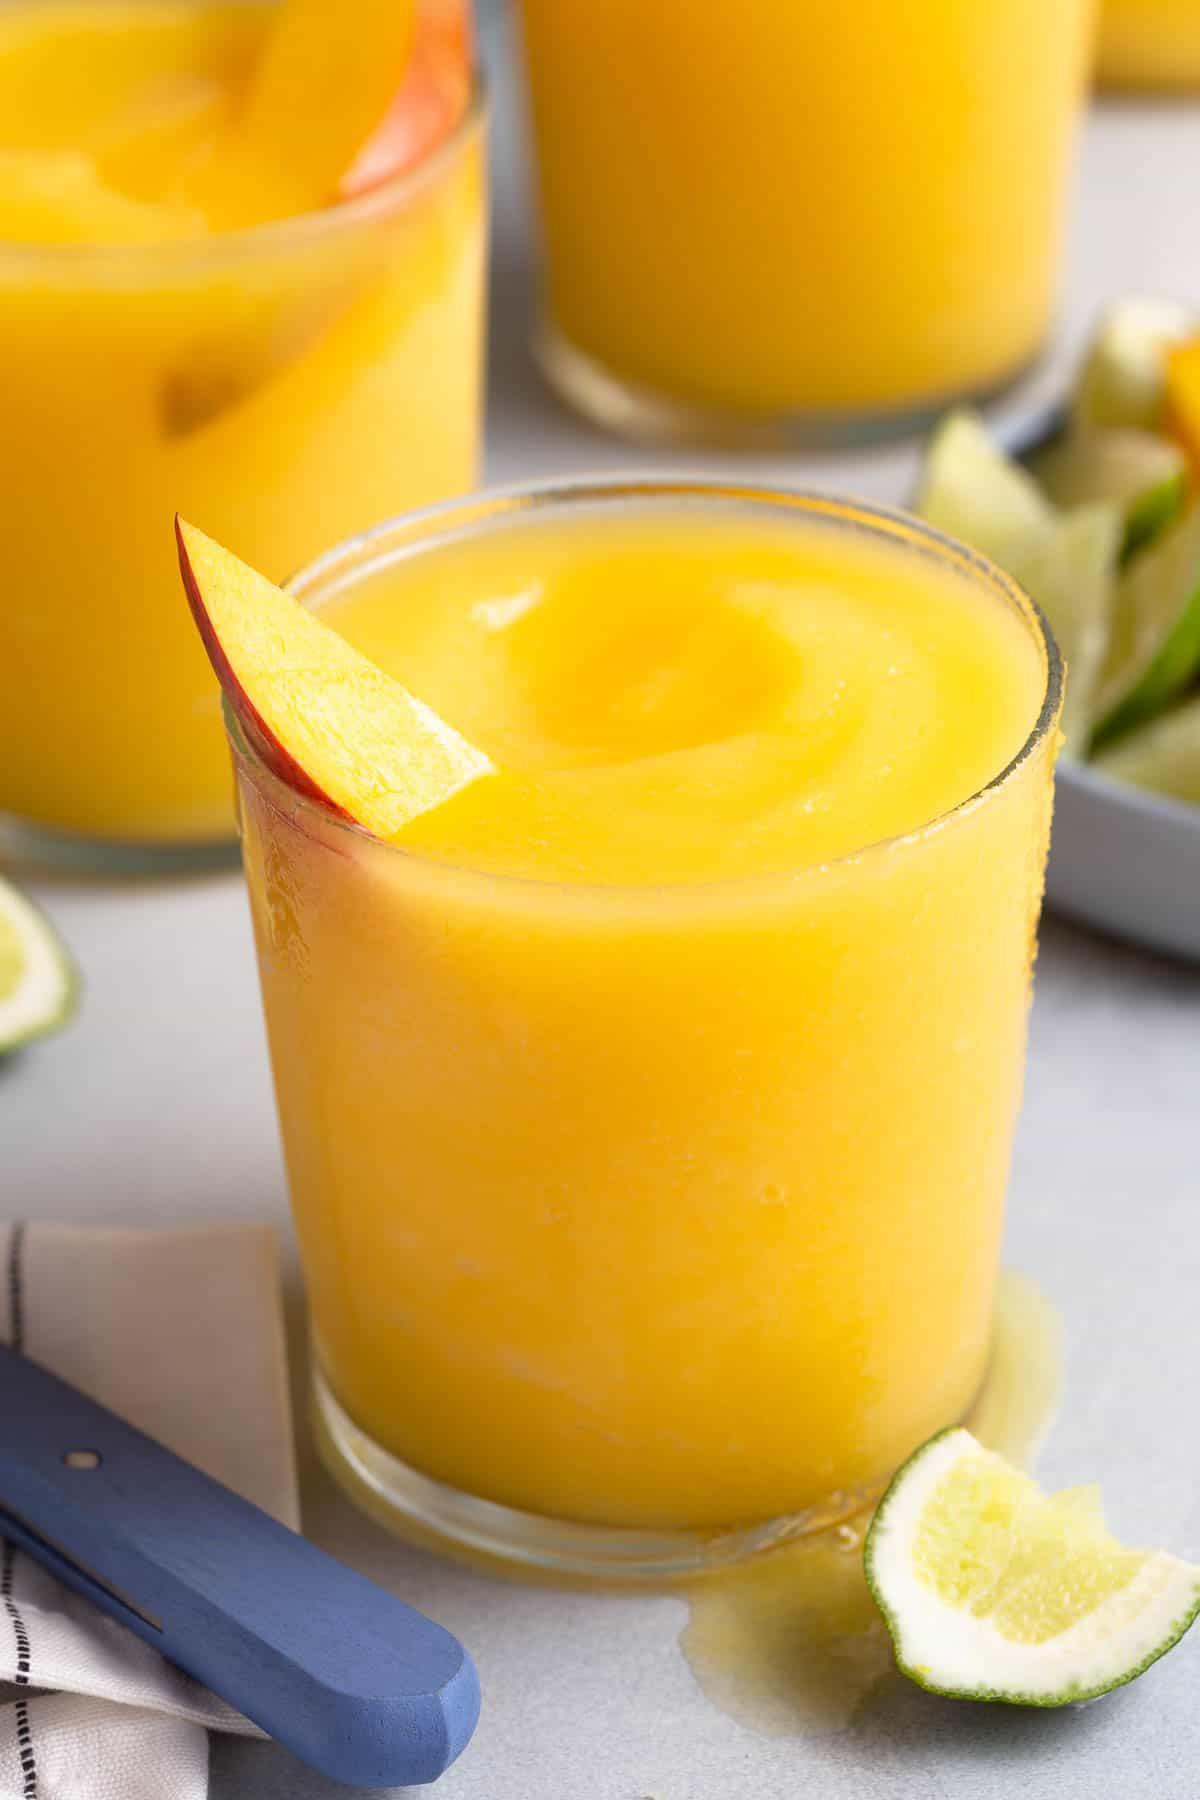 yellow frozen mango margarita in a glass